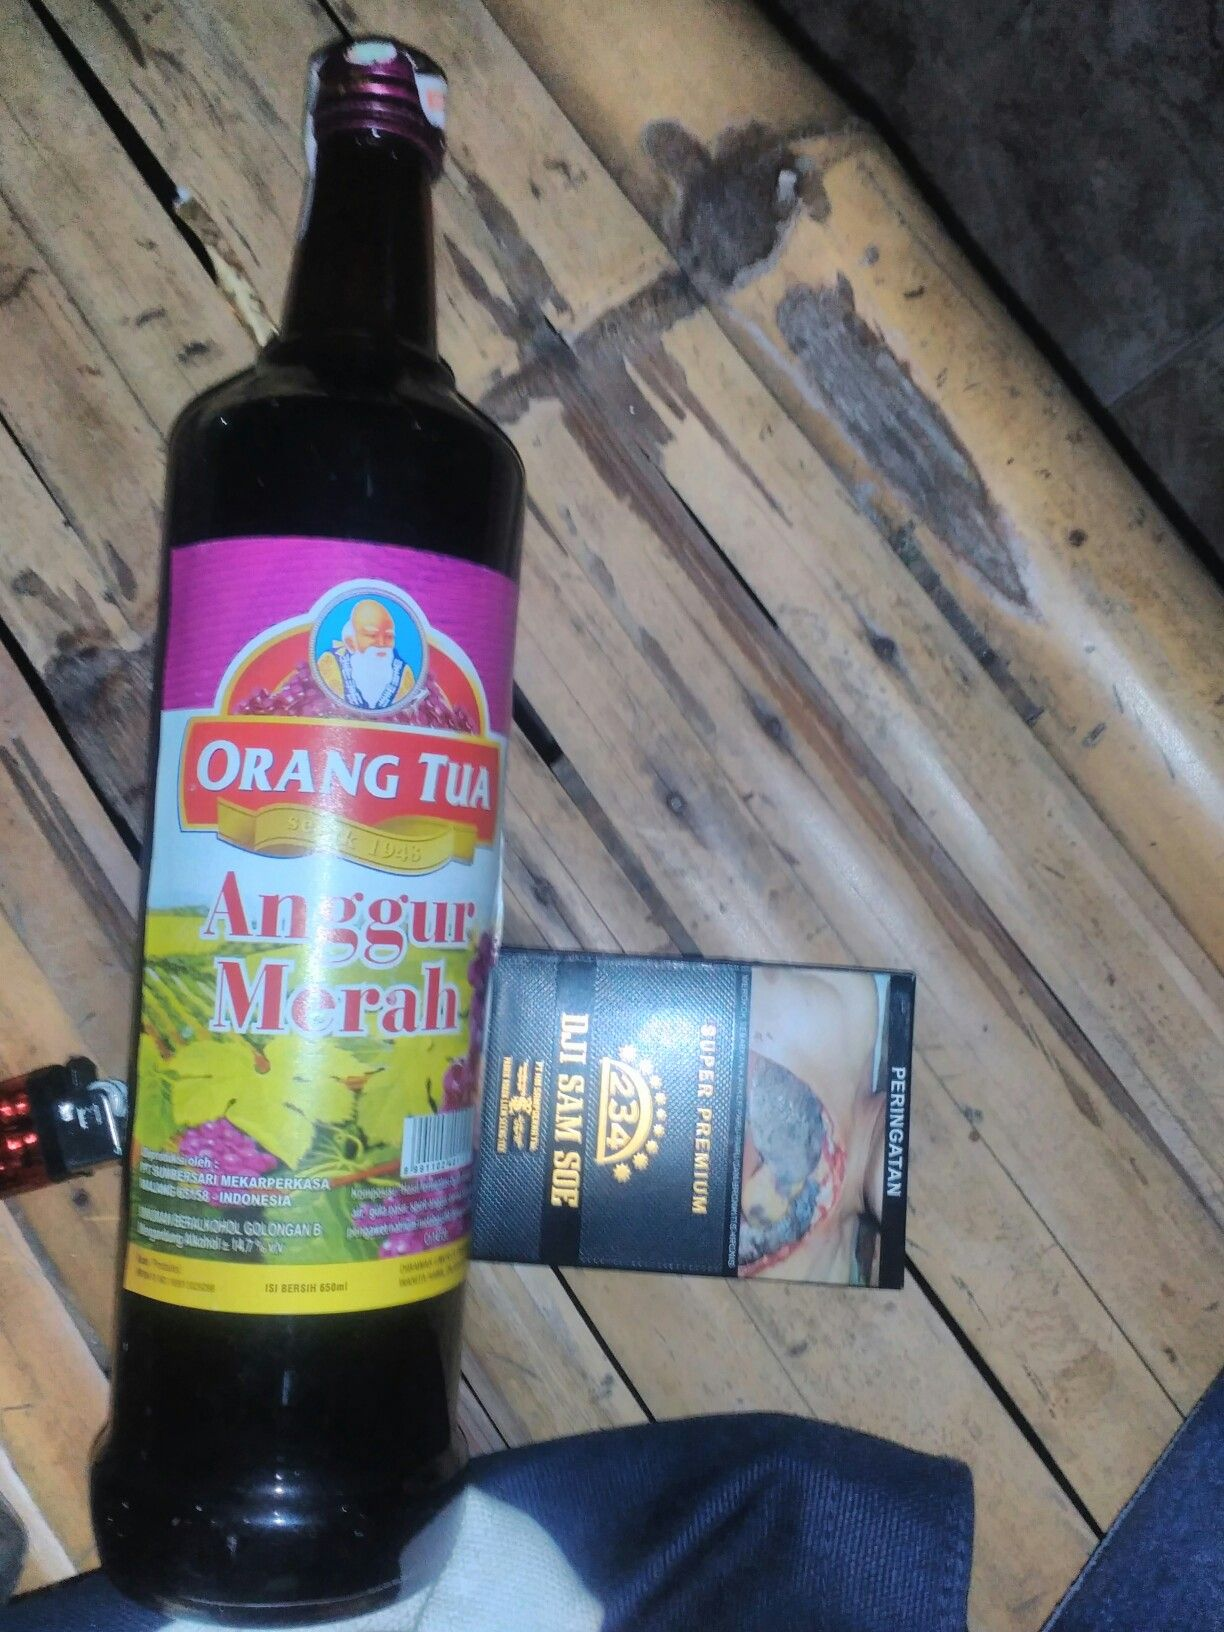 Gambar Anggur Merah Orang Tua : gambar, anggur, merah, orang, Orangtua, Minuman, Keras,, Anggur, Merah,, Alkohol